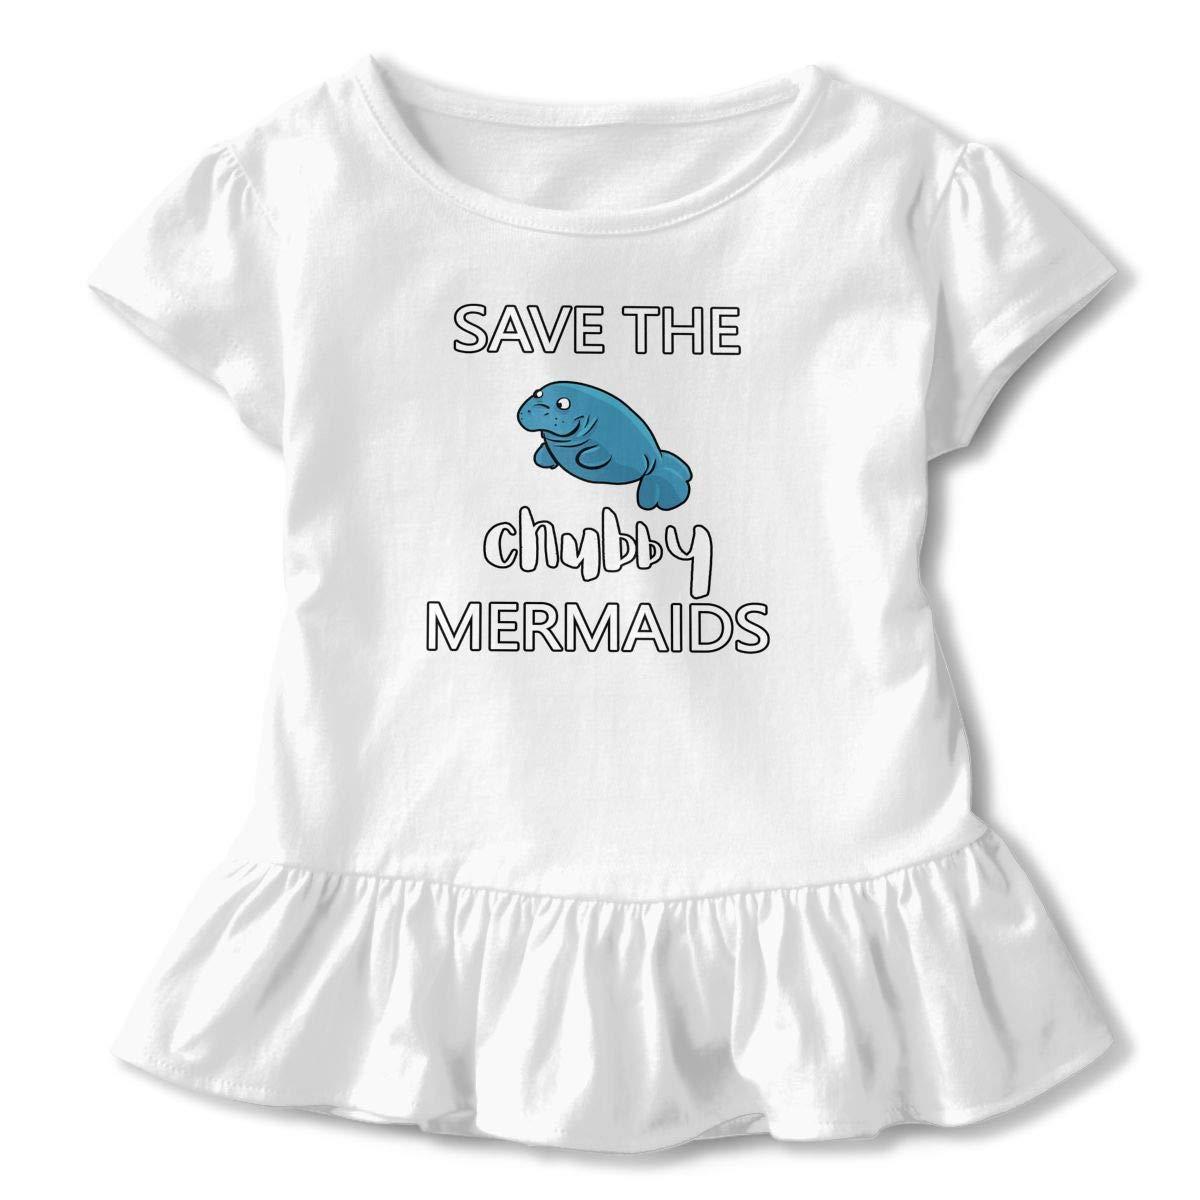 Save The Chubby Mermaid Manatee Toddler Baby Girls Cotton Ruffle Short Sleeve Top Soft T-Shirt 2-6T